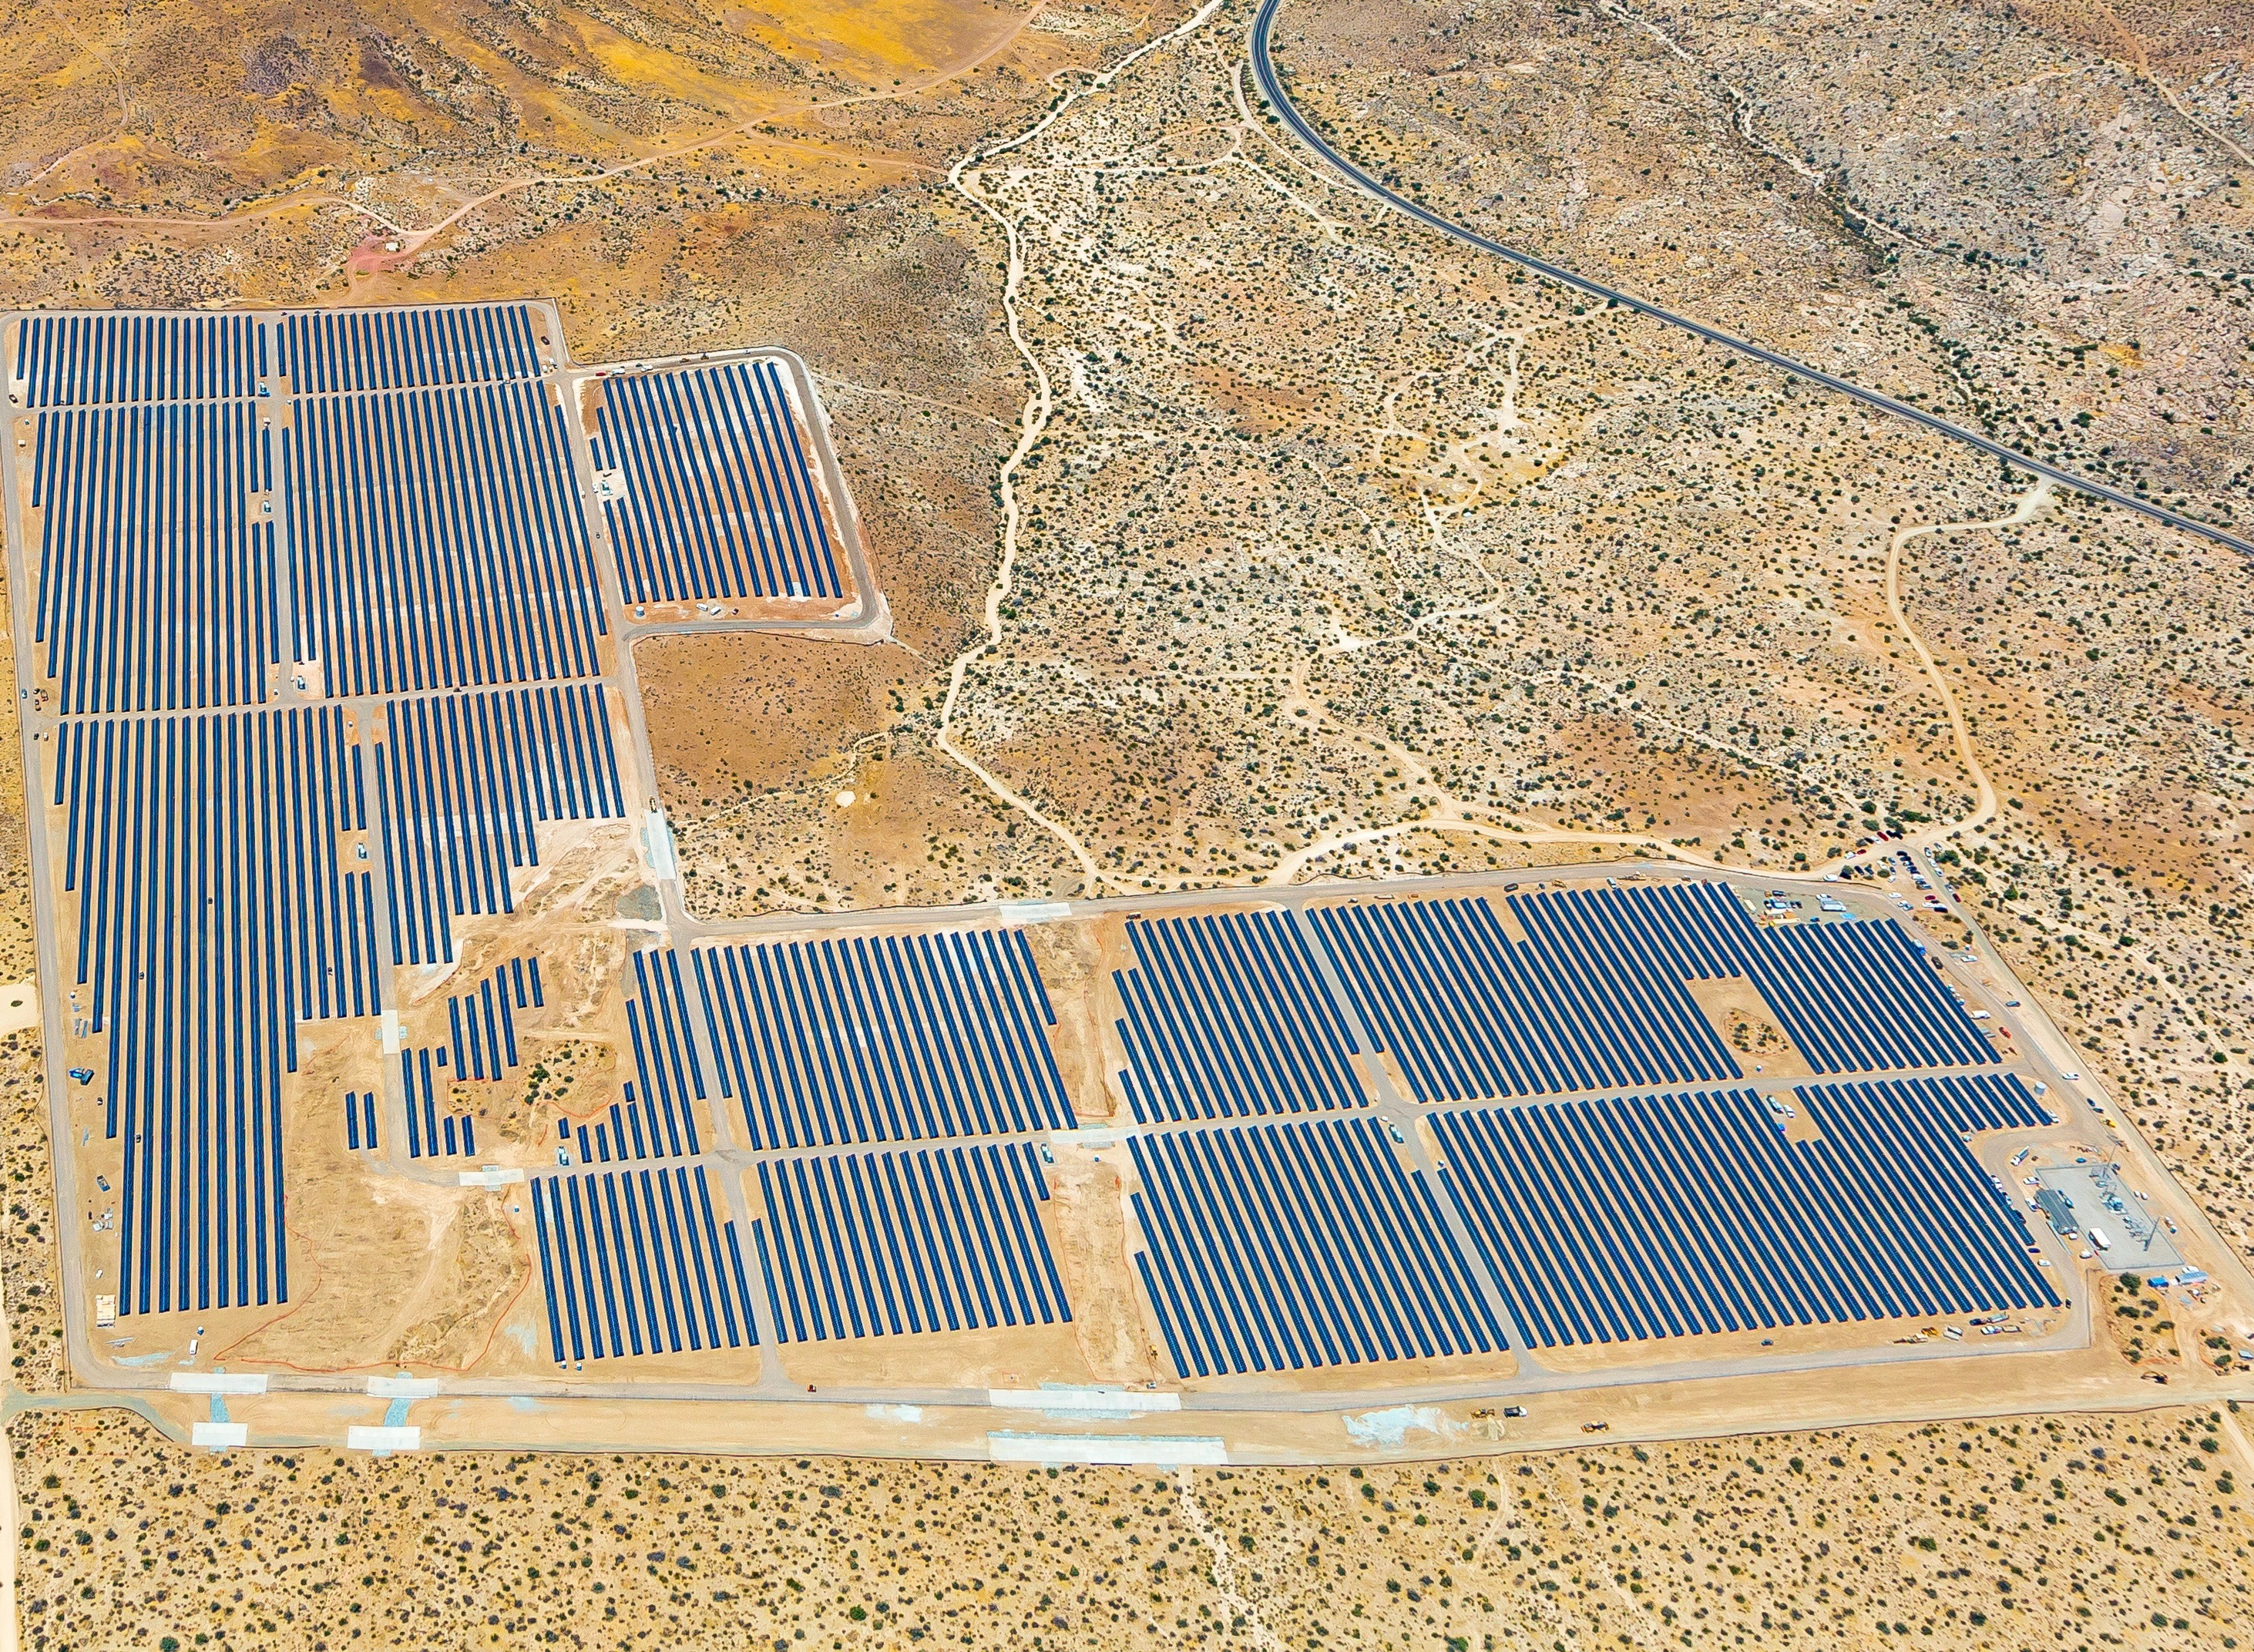 BayWa r.e. celebrates commissioning of Jacumba Solar Project in California